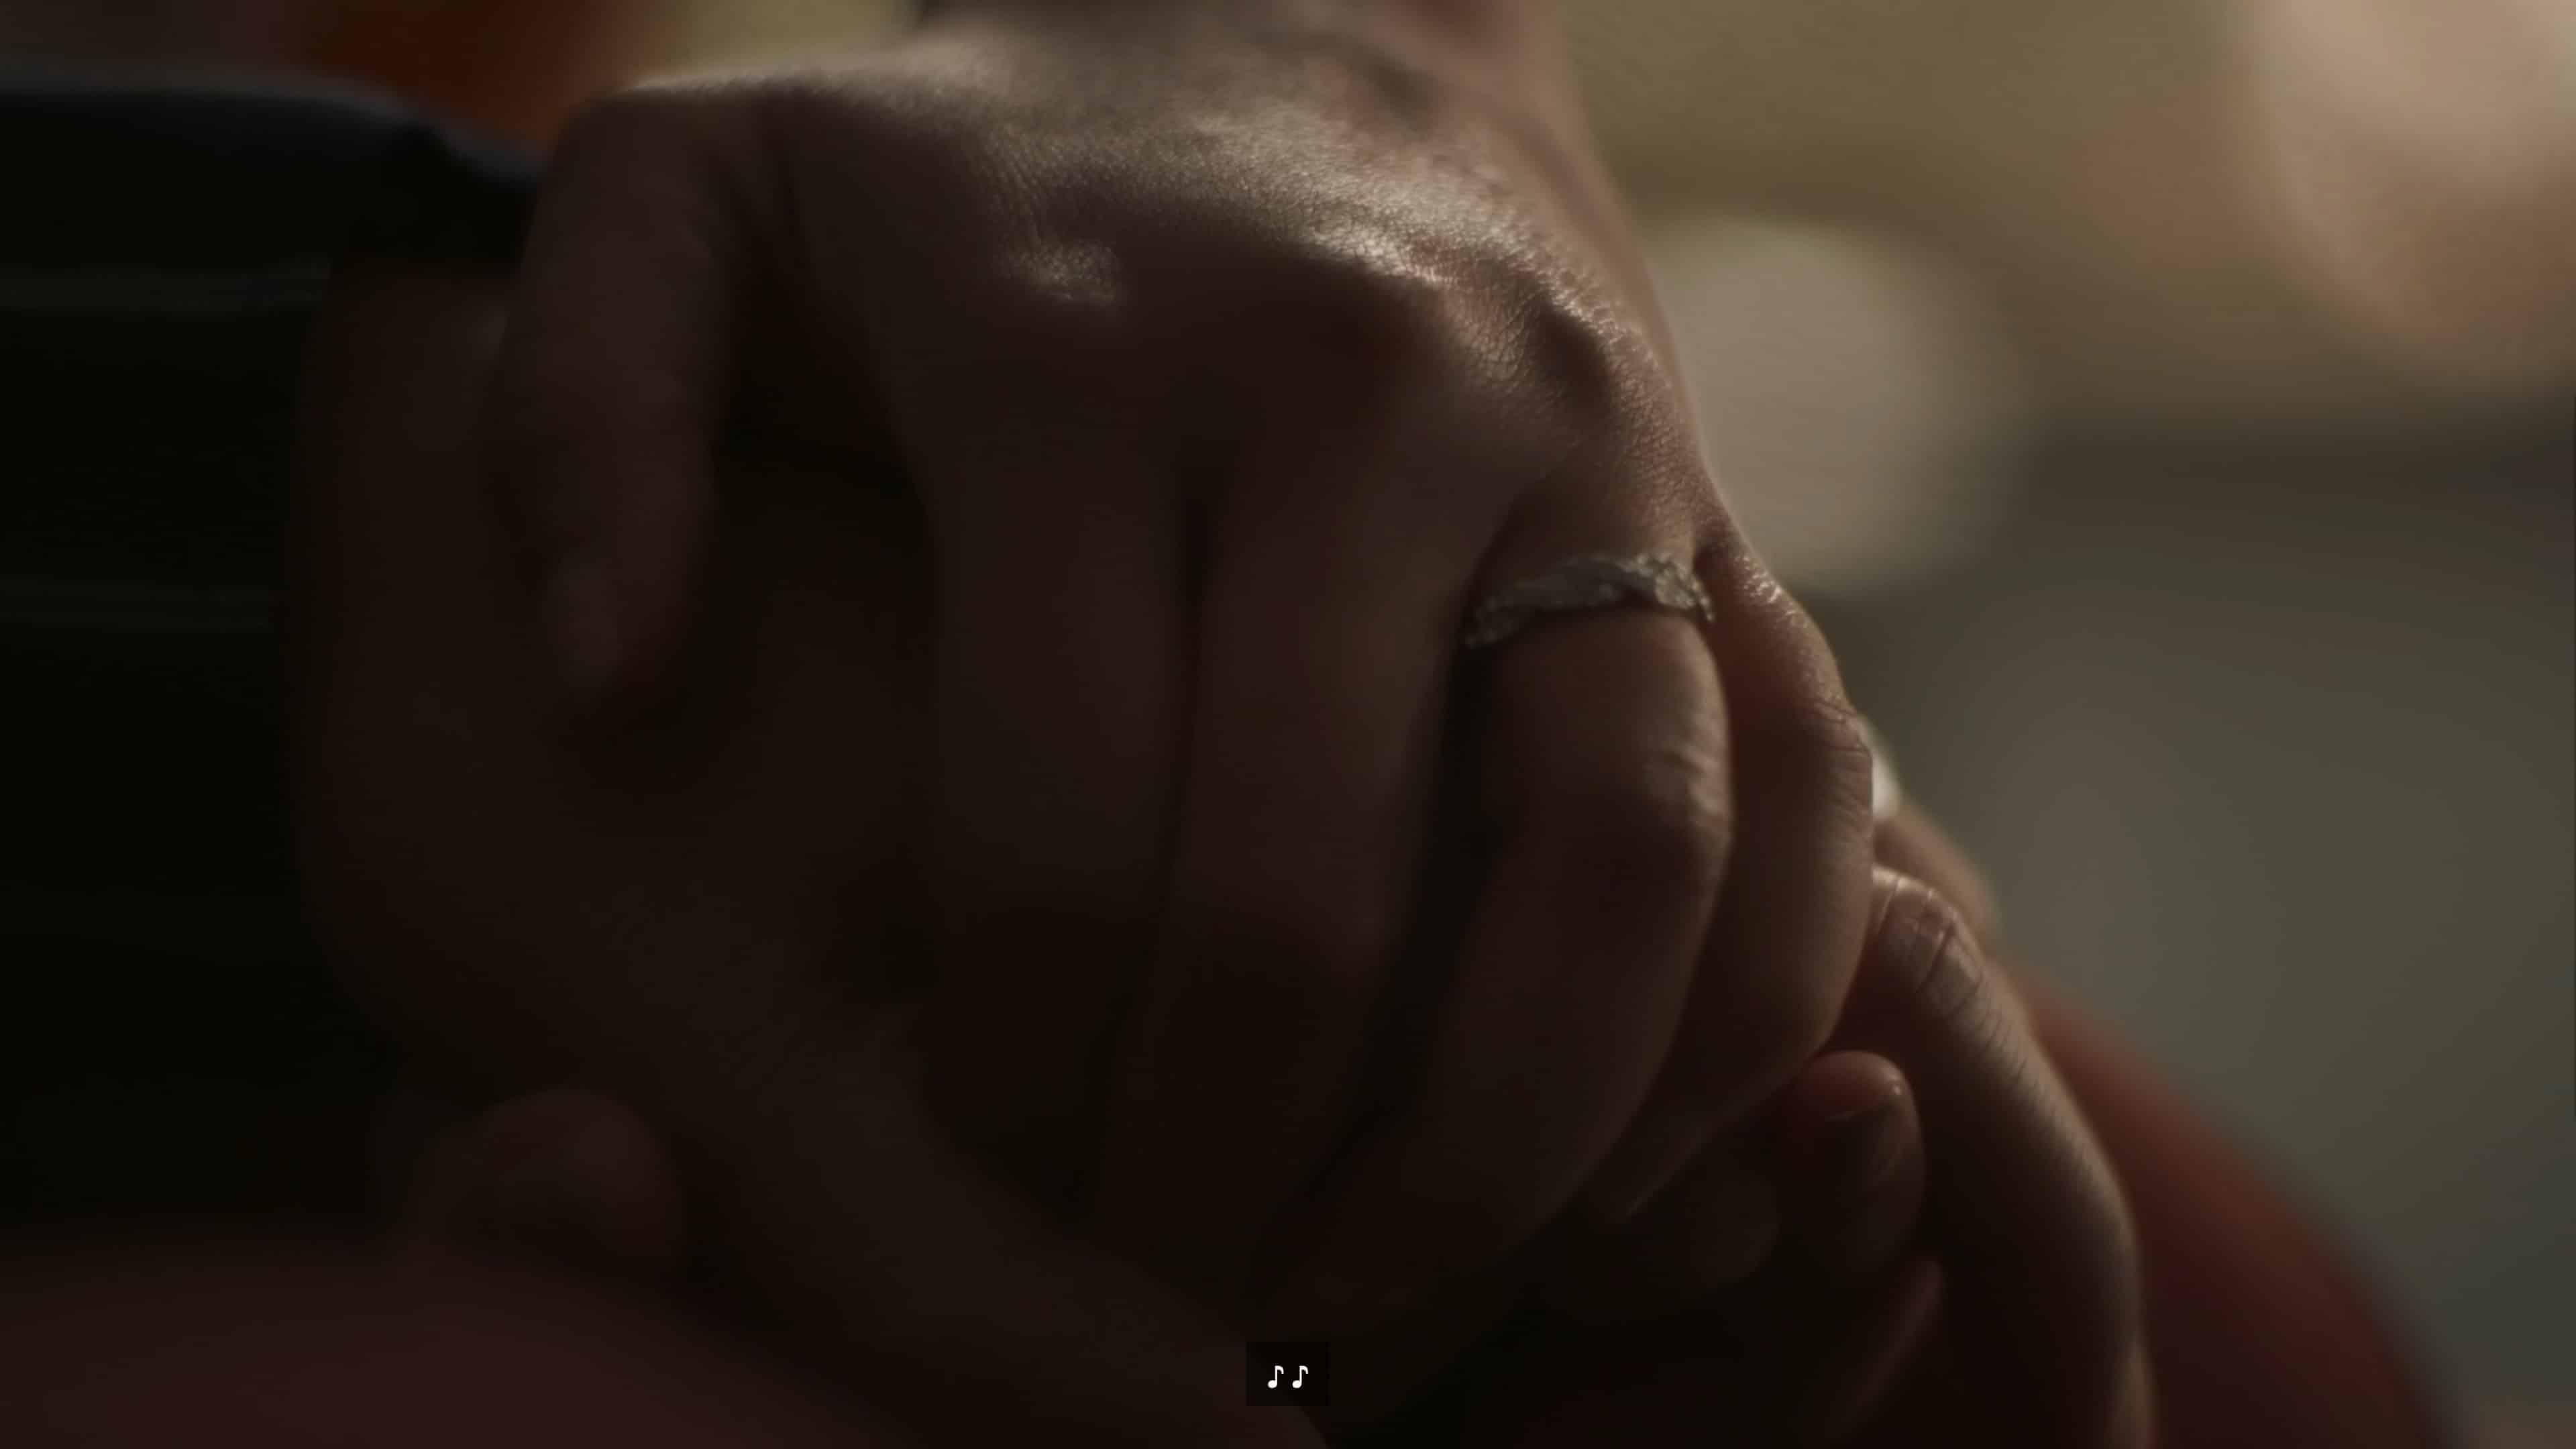 Layne's wedding ring